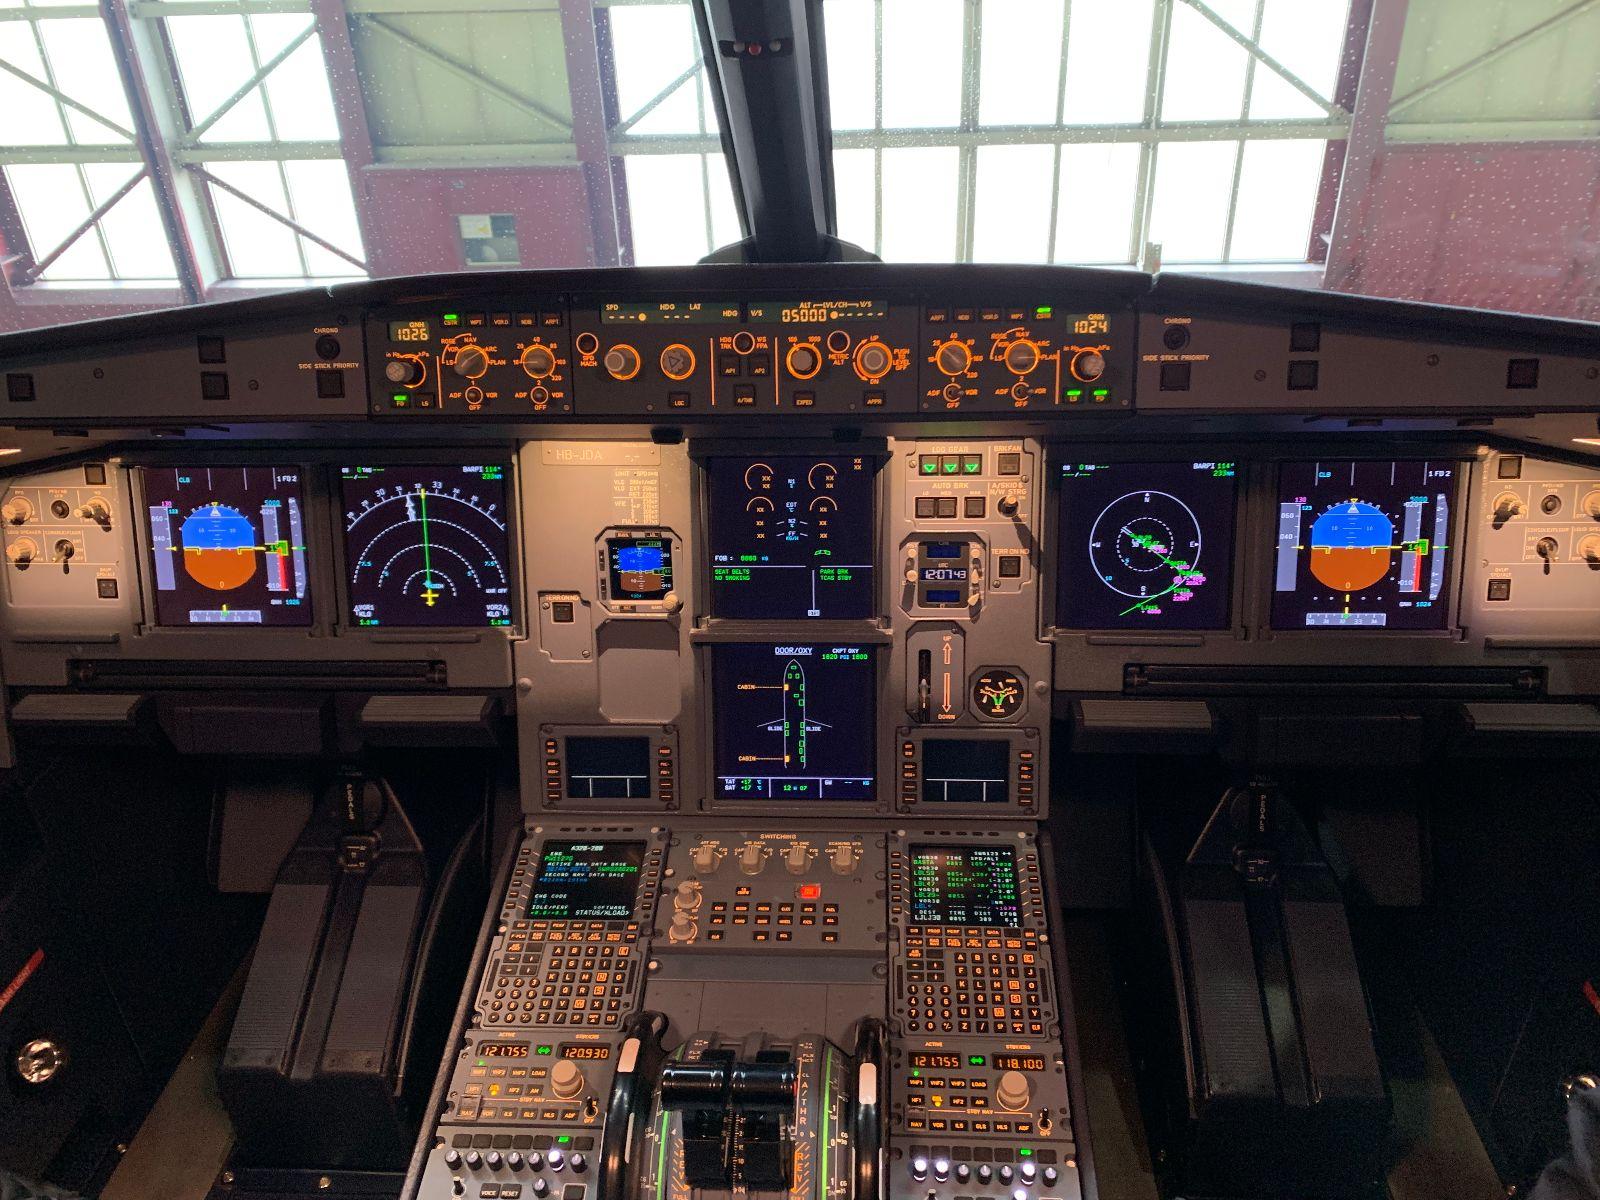 swiss-airbus-a320neo-cockpit.jpg